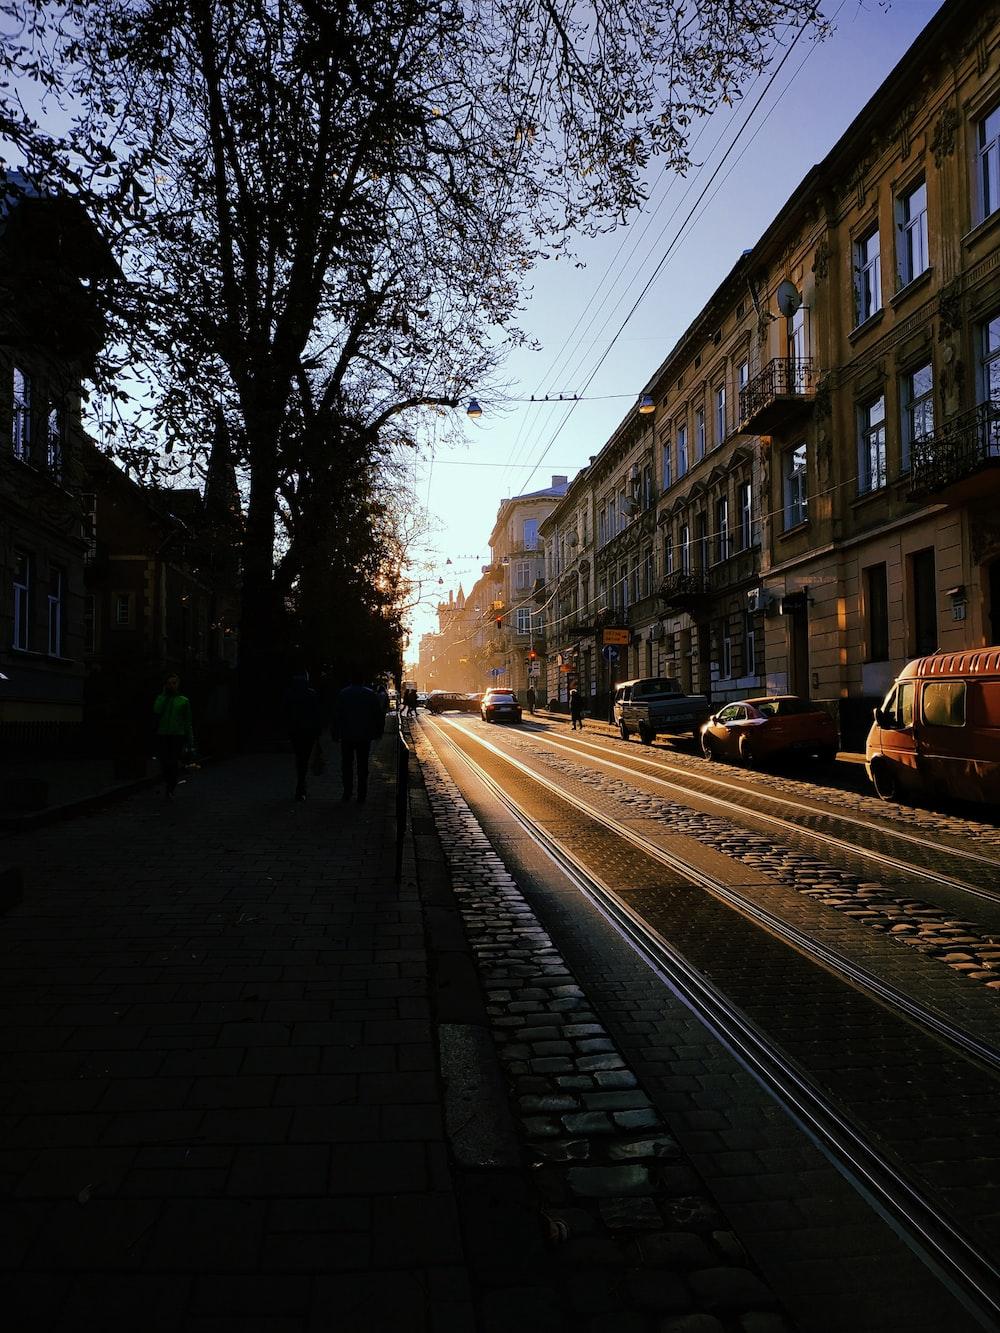 people walking on sidewalk near train tracks during daytime